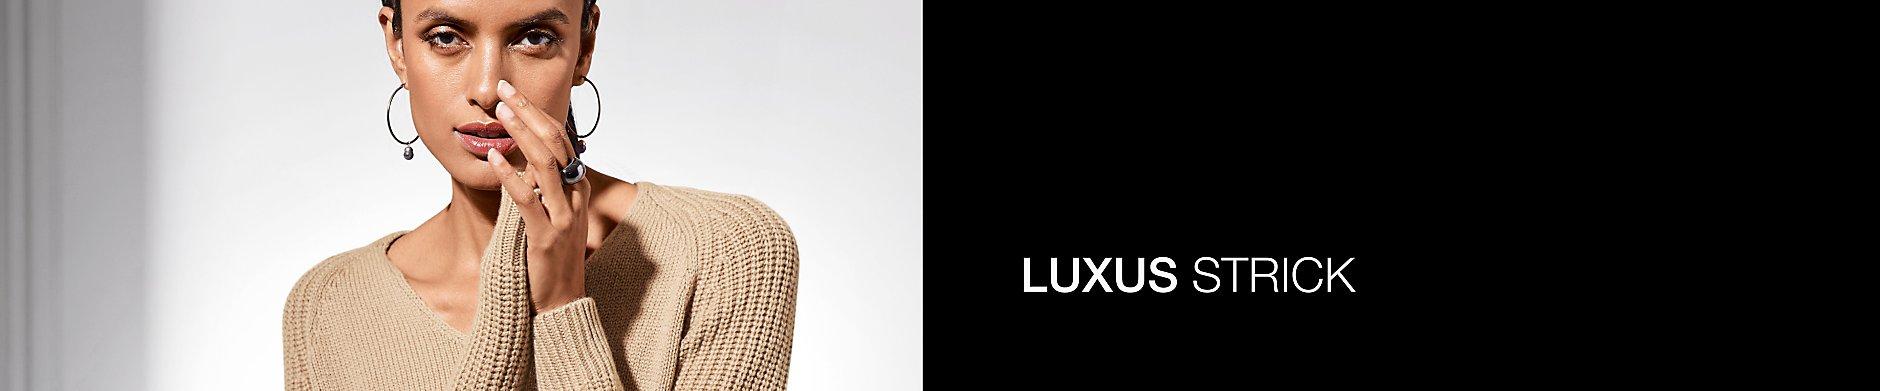 LUXUS STRICK